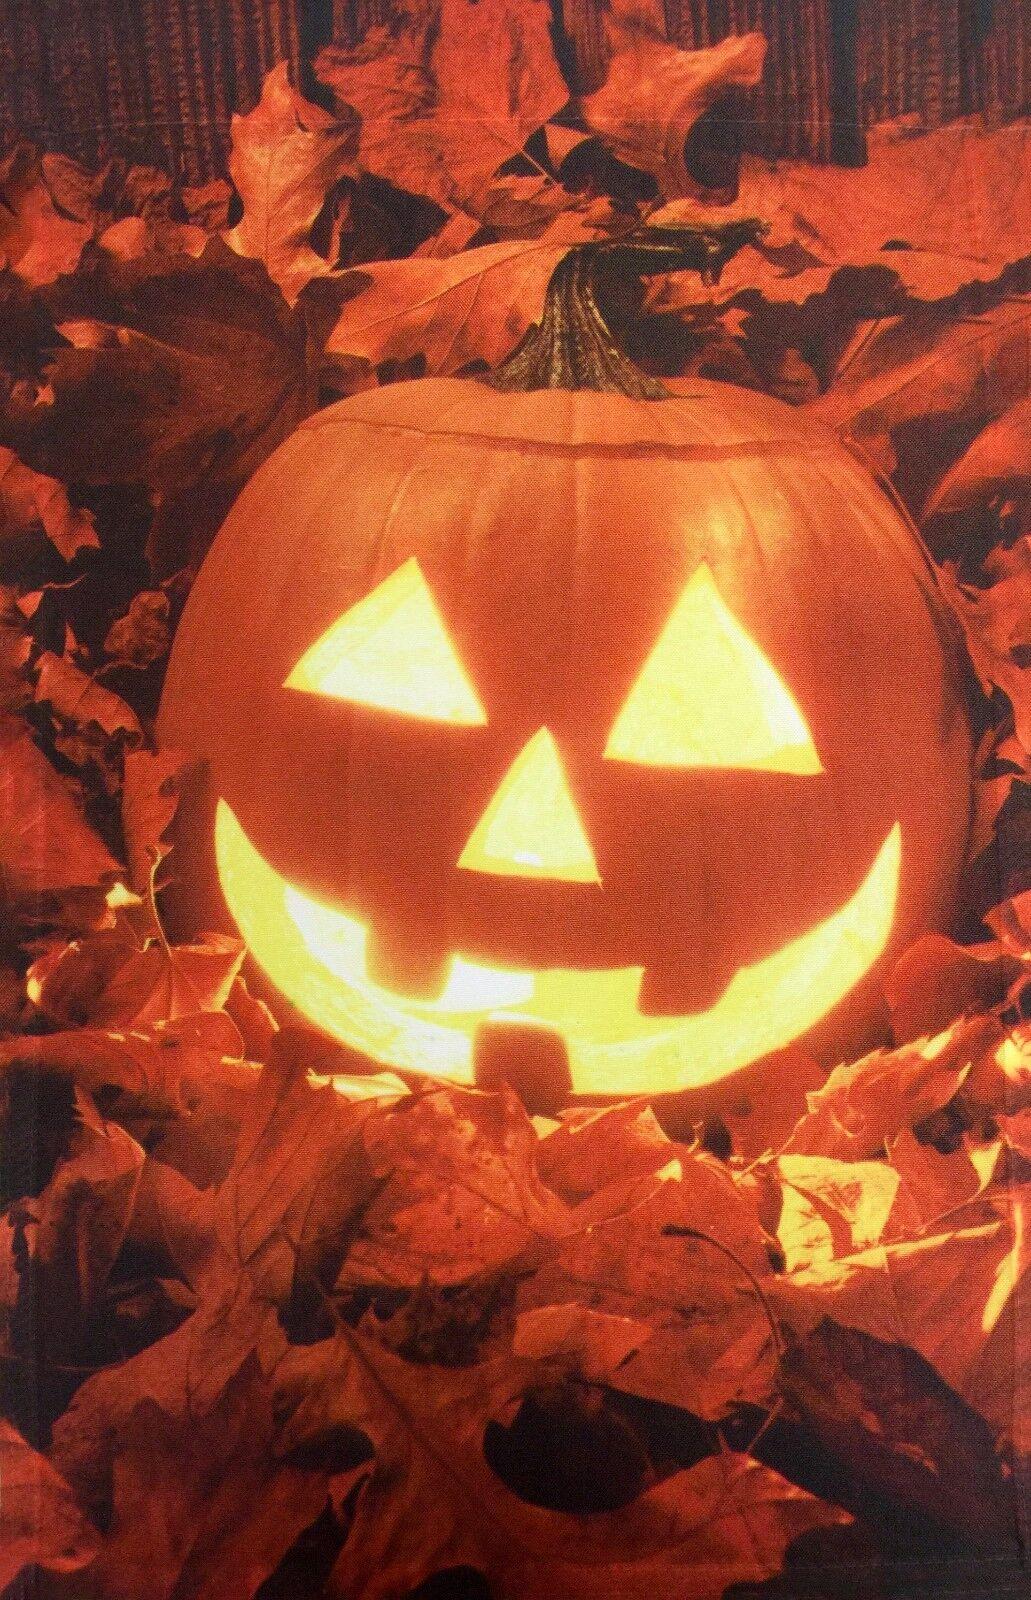 halloween jack o lantern pumpkin garden flag